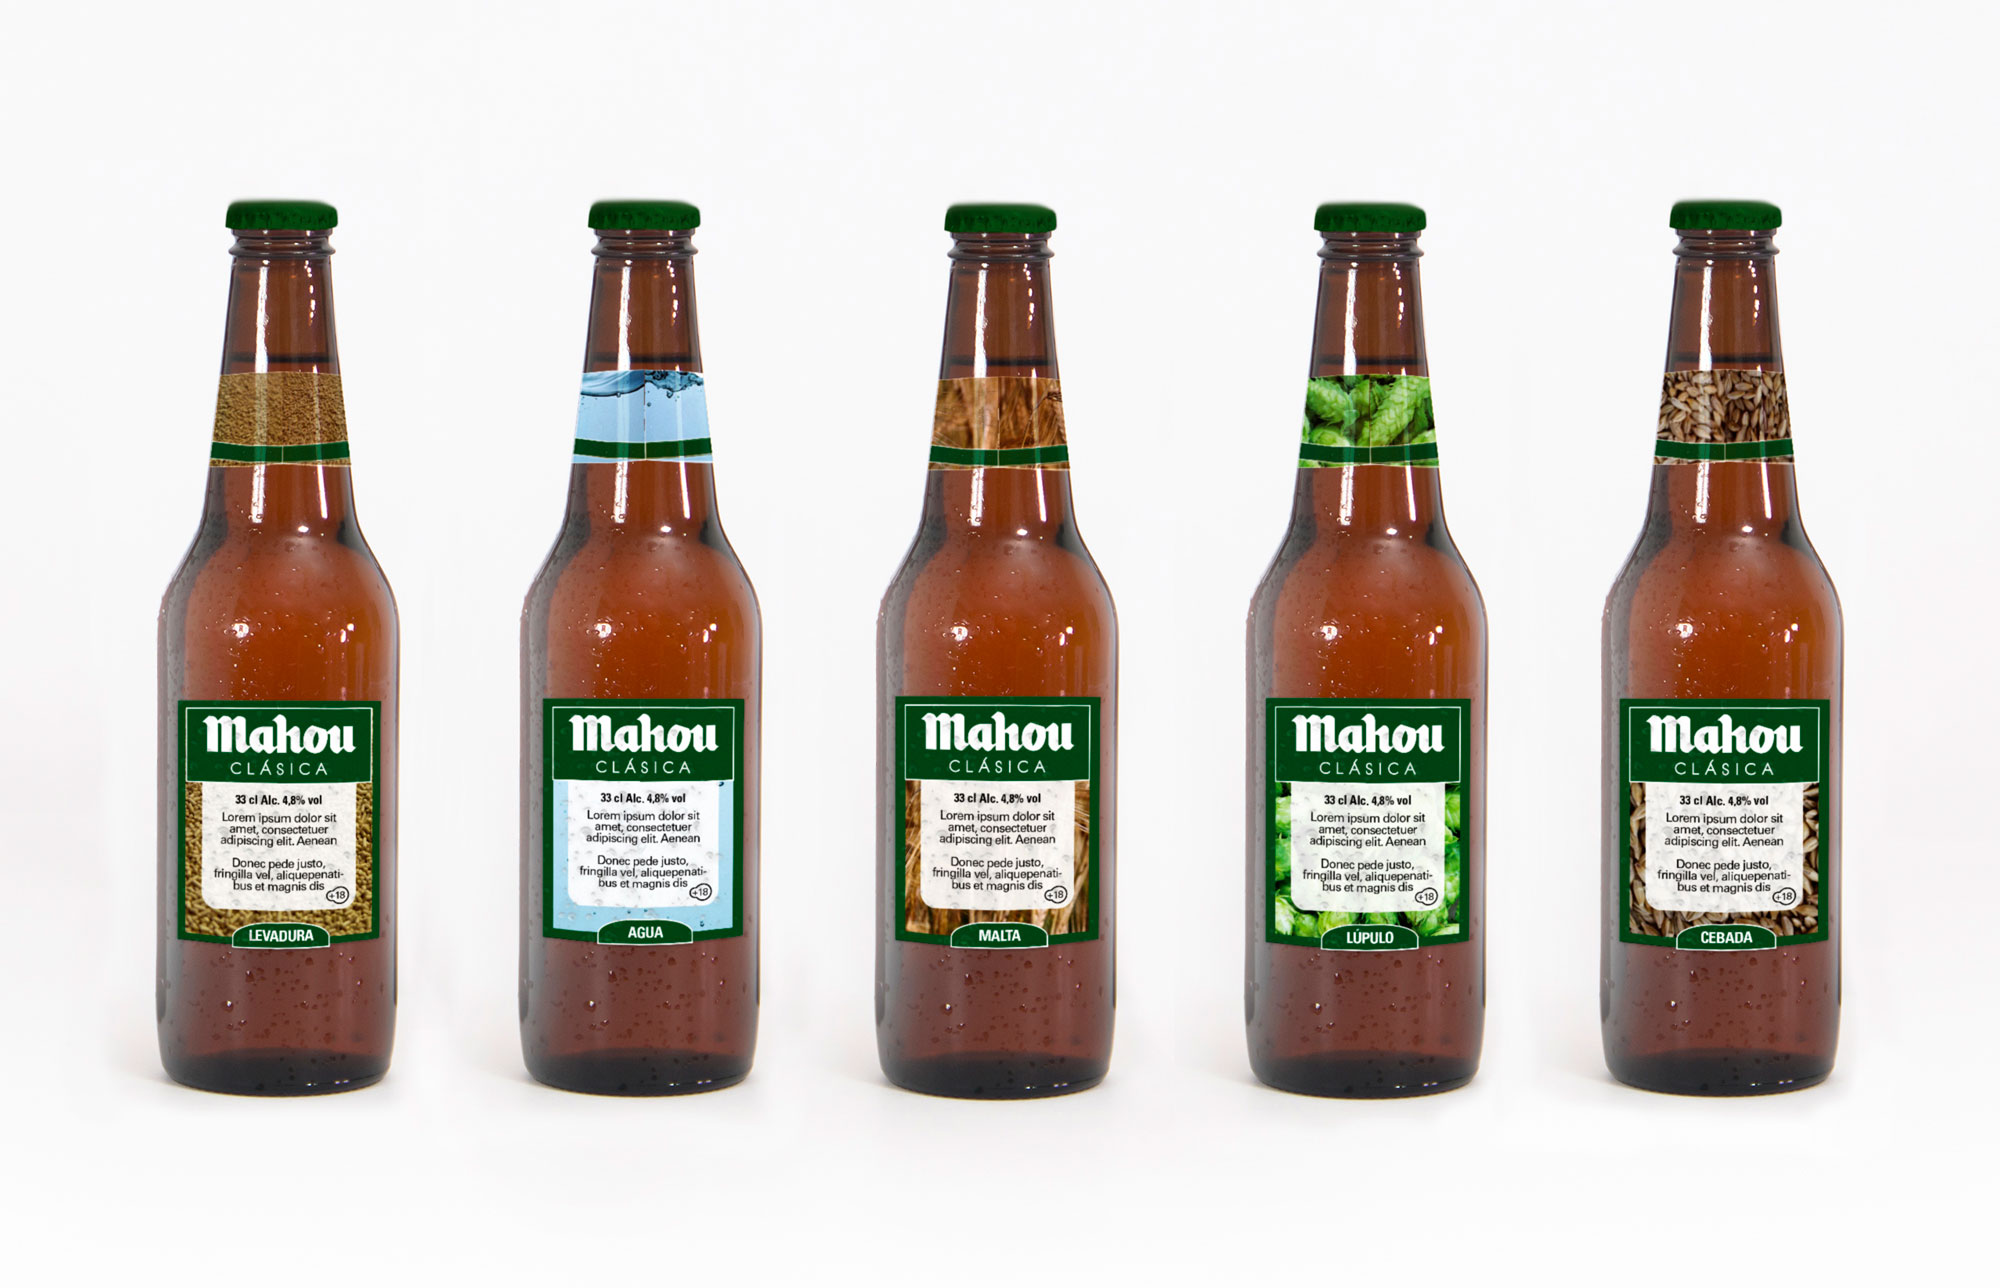 Back bottles